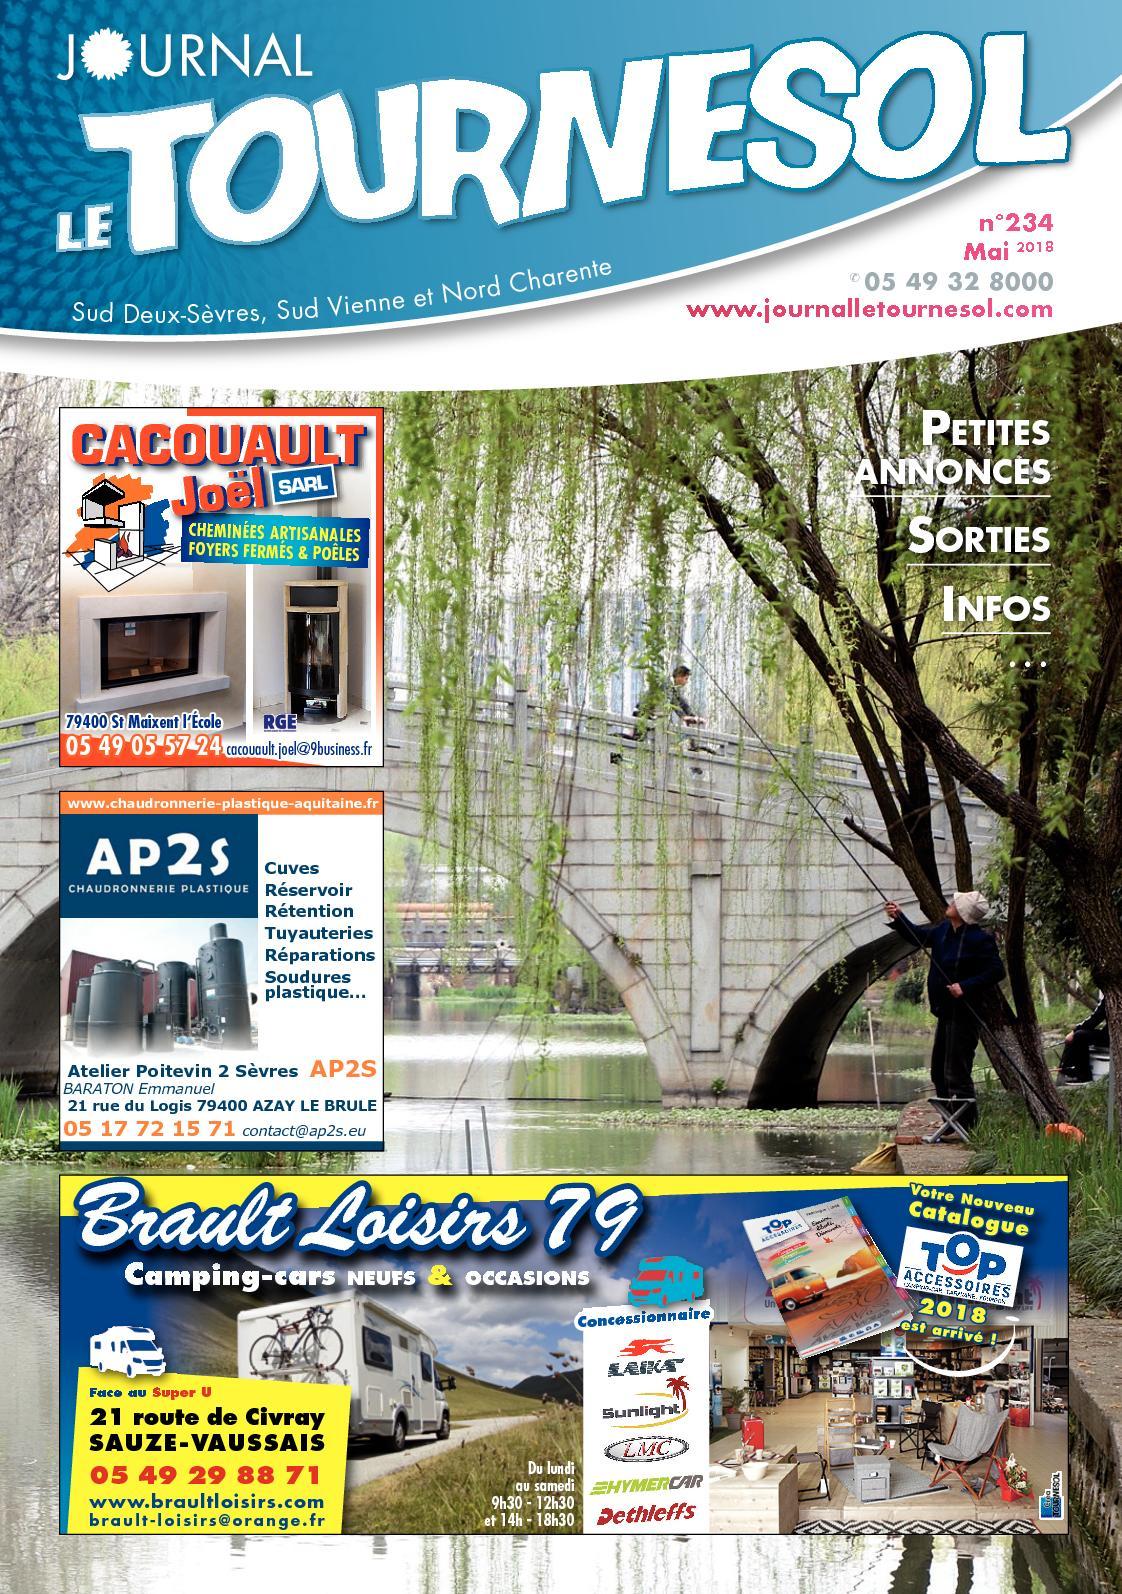 Brico Depot Angoulême Impressionnant Stock Calaméo Journal Le tournesol Mai 2018